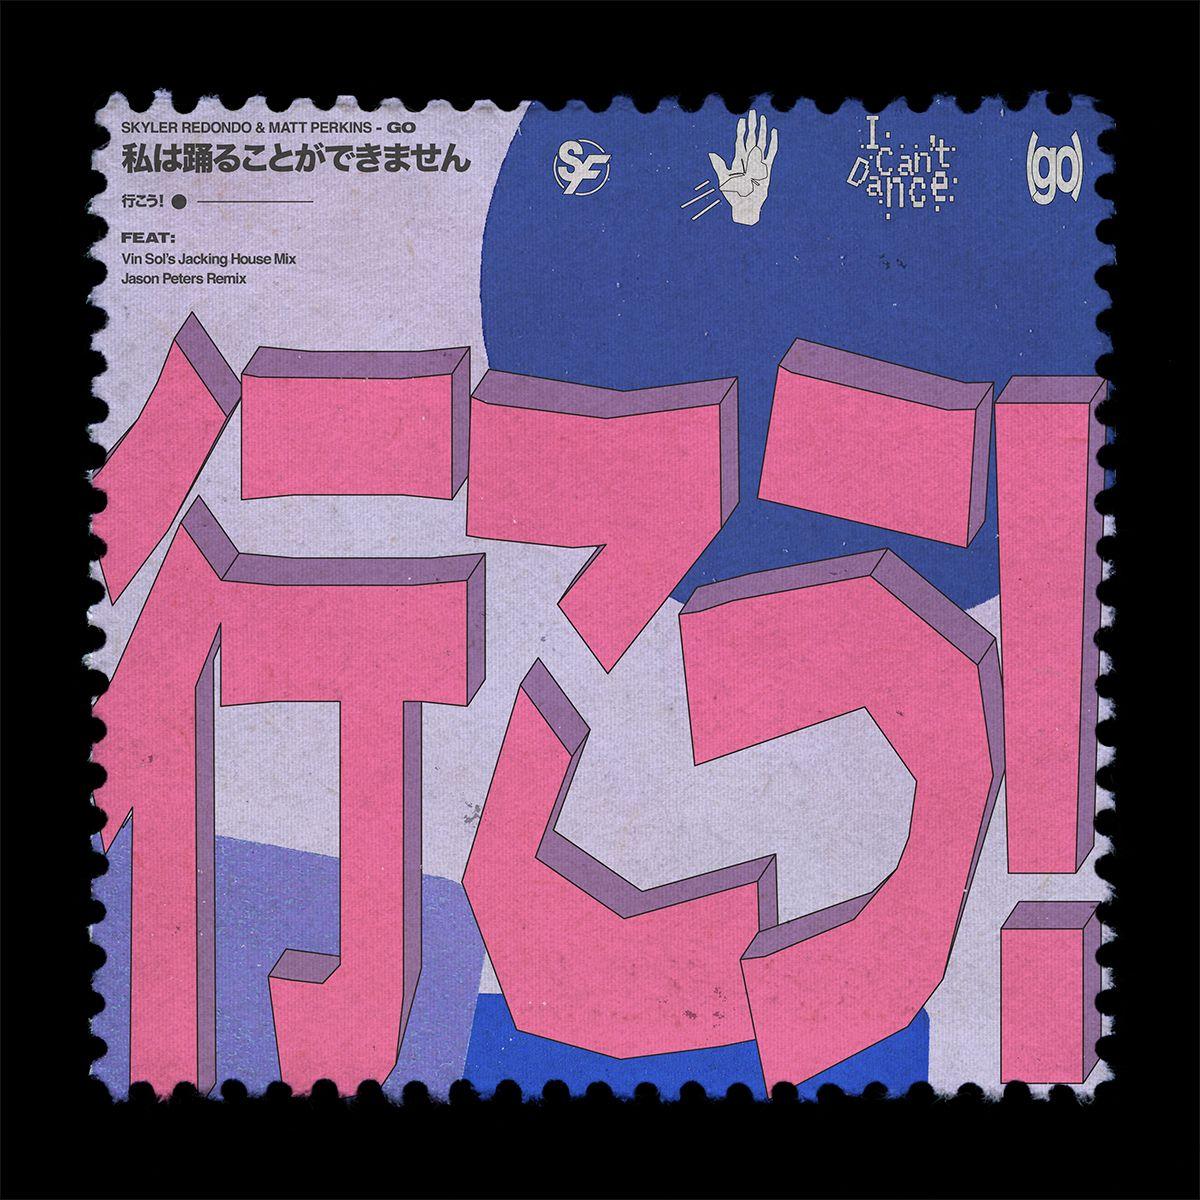 #graphicdesign #design #graphicdesigner #poster #posterart #graphic #branding #artist #typography #designers #digitalart #grunge #grain #photoshop #housemusic #illustrator #thrash #housemusic #dj #techno #deephouse #music #techhouse #edm #house #party #electronicmusic #djlife #dance #dancemusic #djs #rave #producer #technomusic #love #housemusiclovers #trance #ibiza #hiphop #disco #festival #djset #nightlife #club #edmfamily #deephousemusic #bhfyp